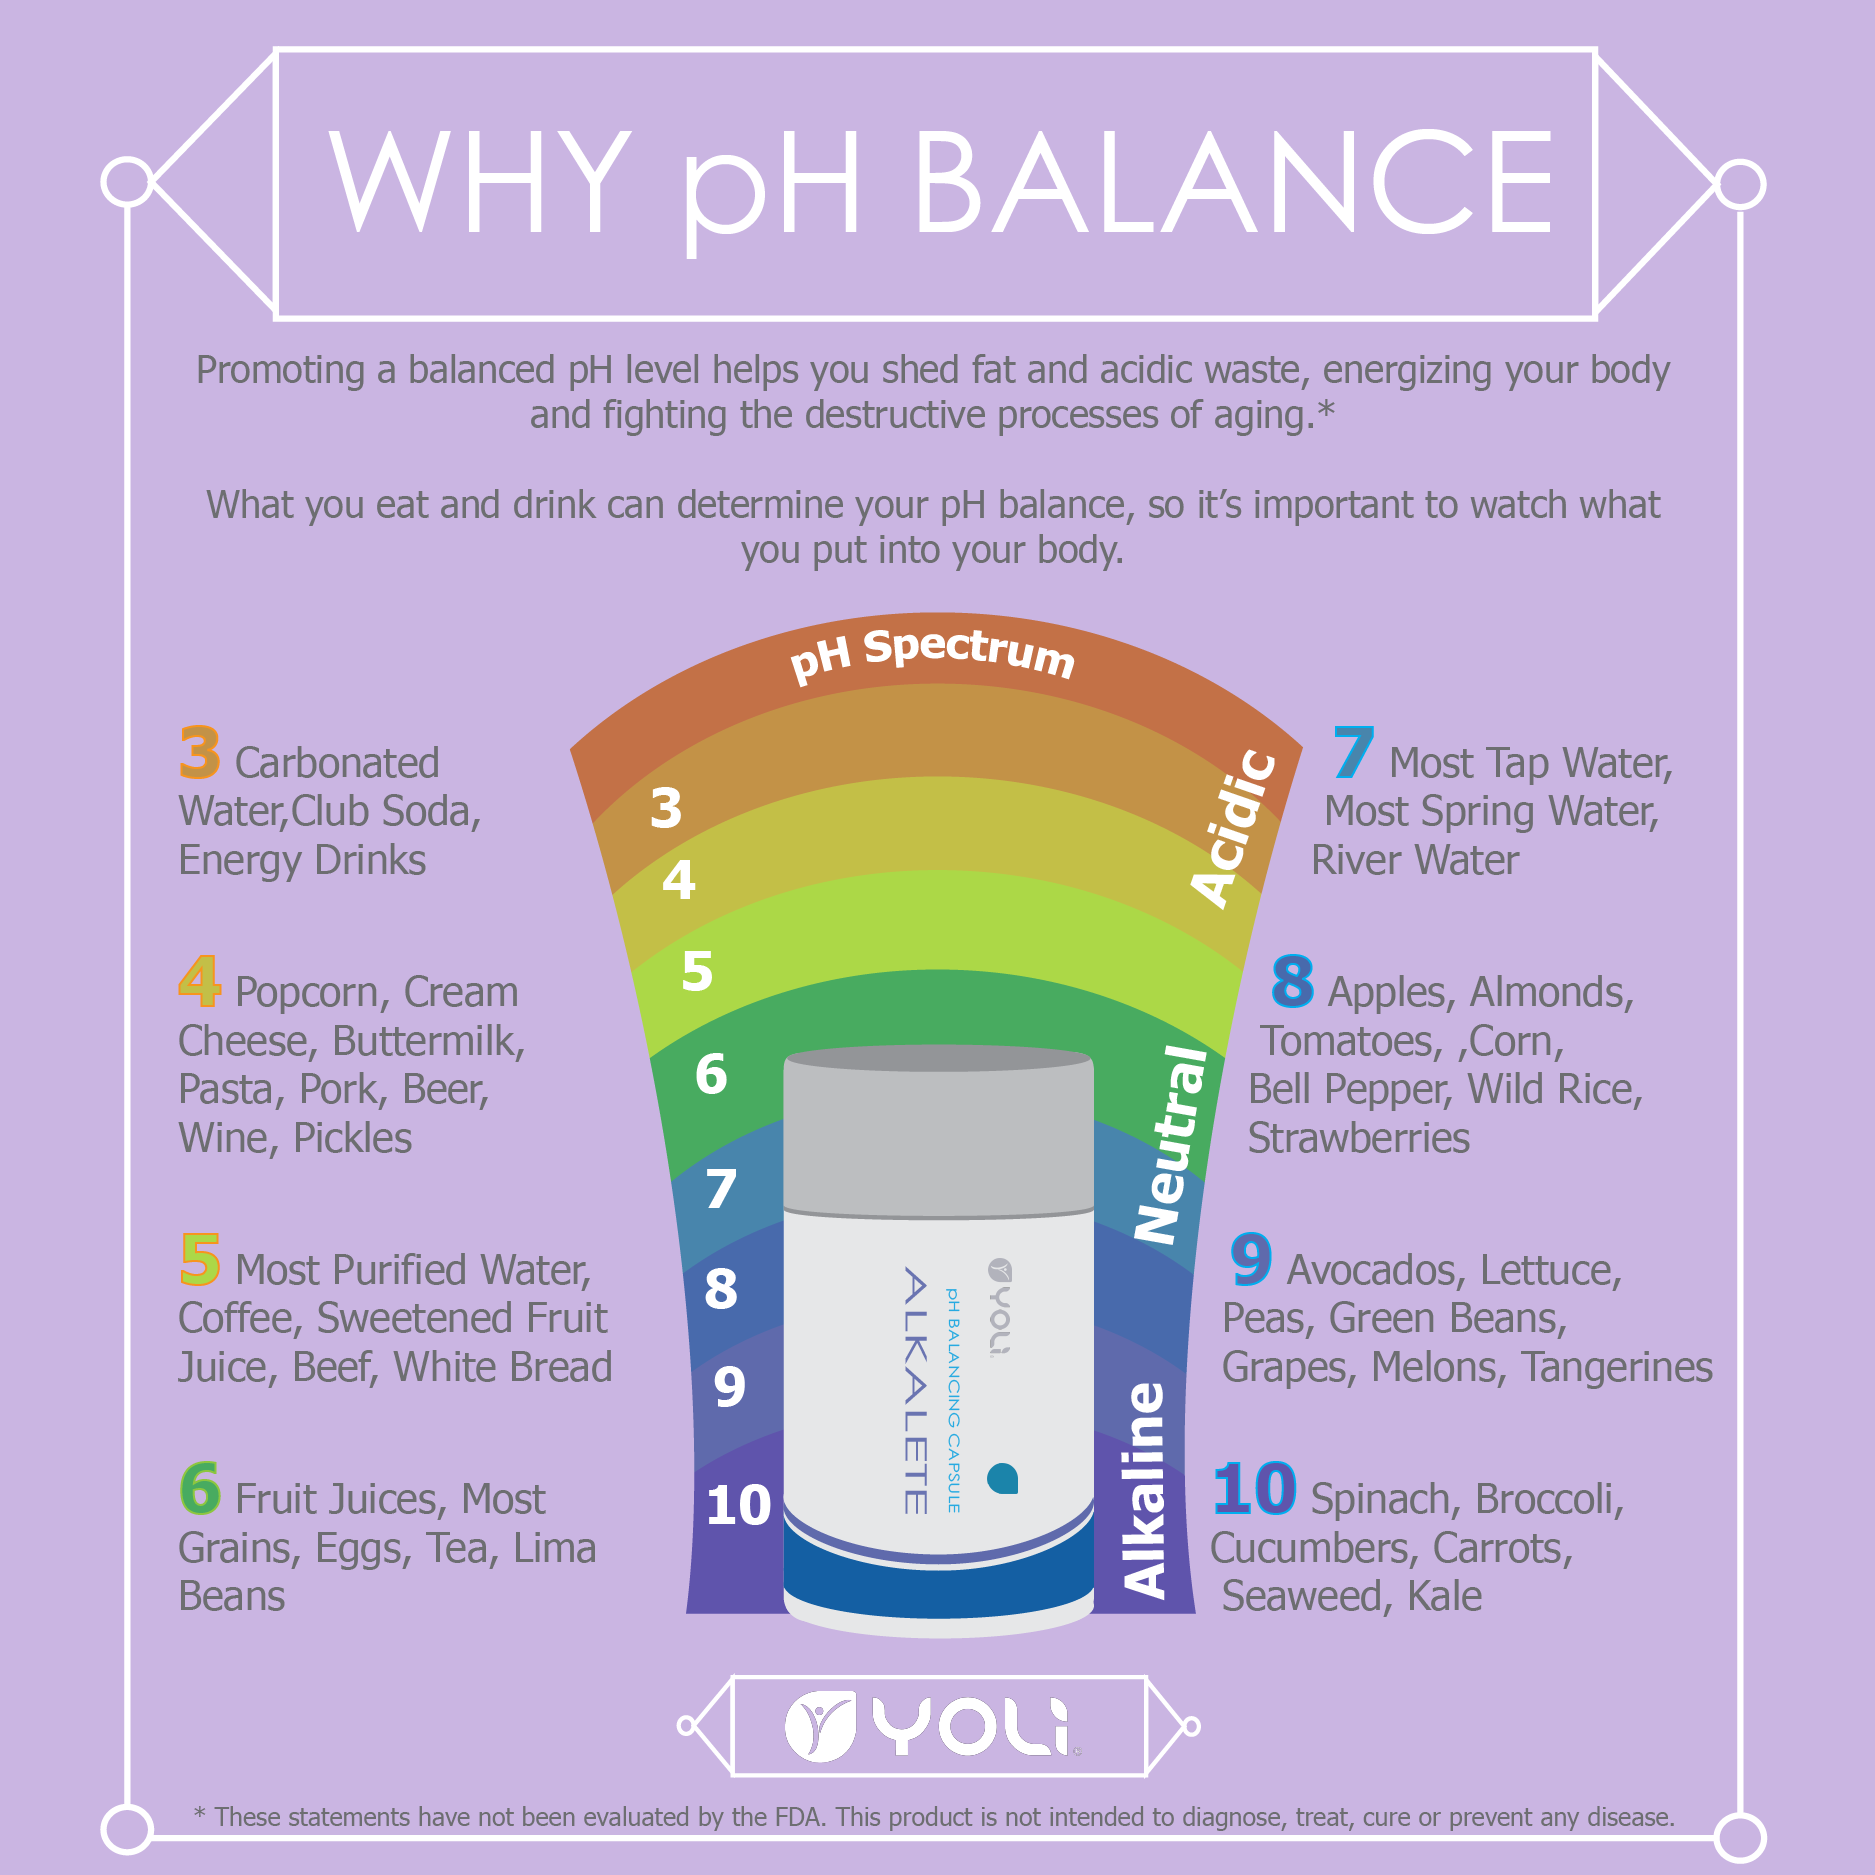 Pin de Yoli Better Body System en Fun Facts | Pinterest